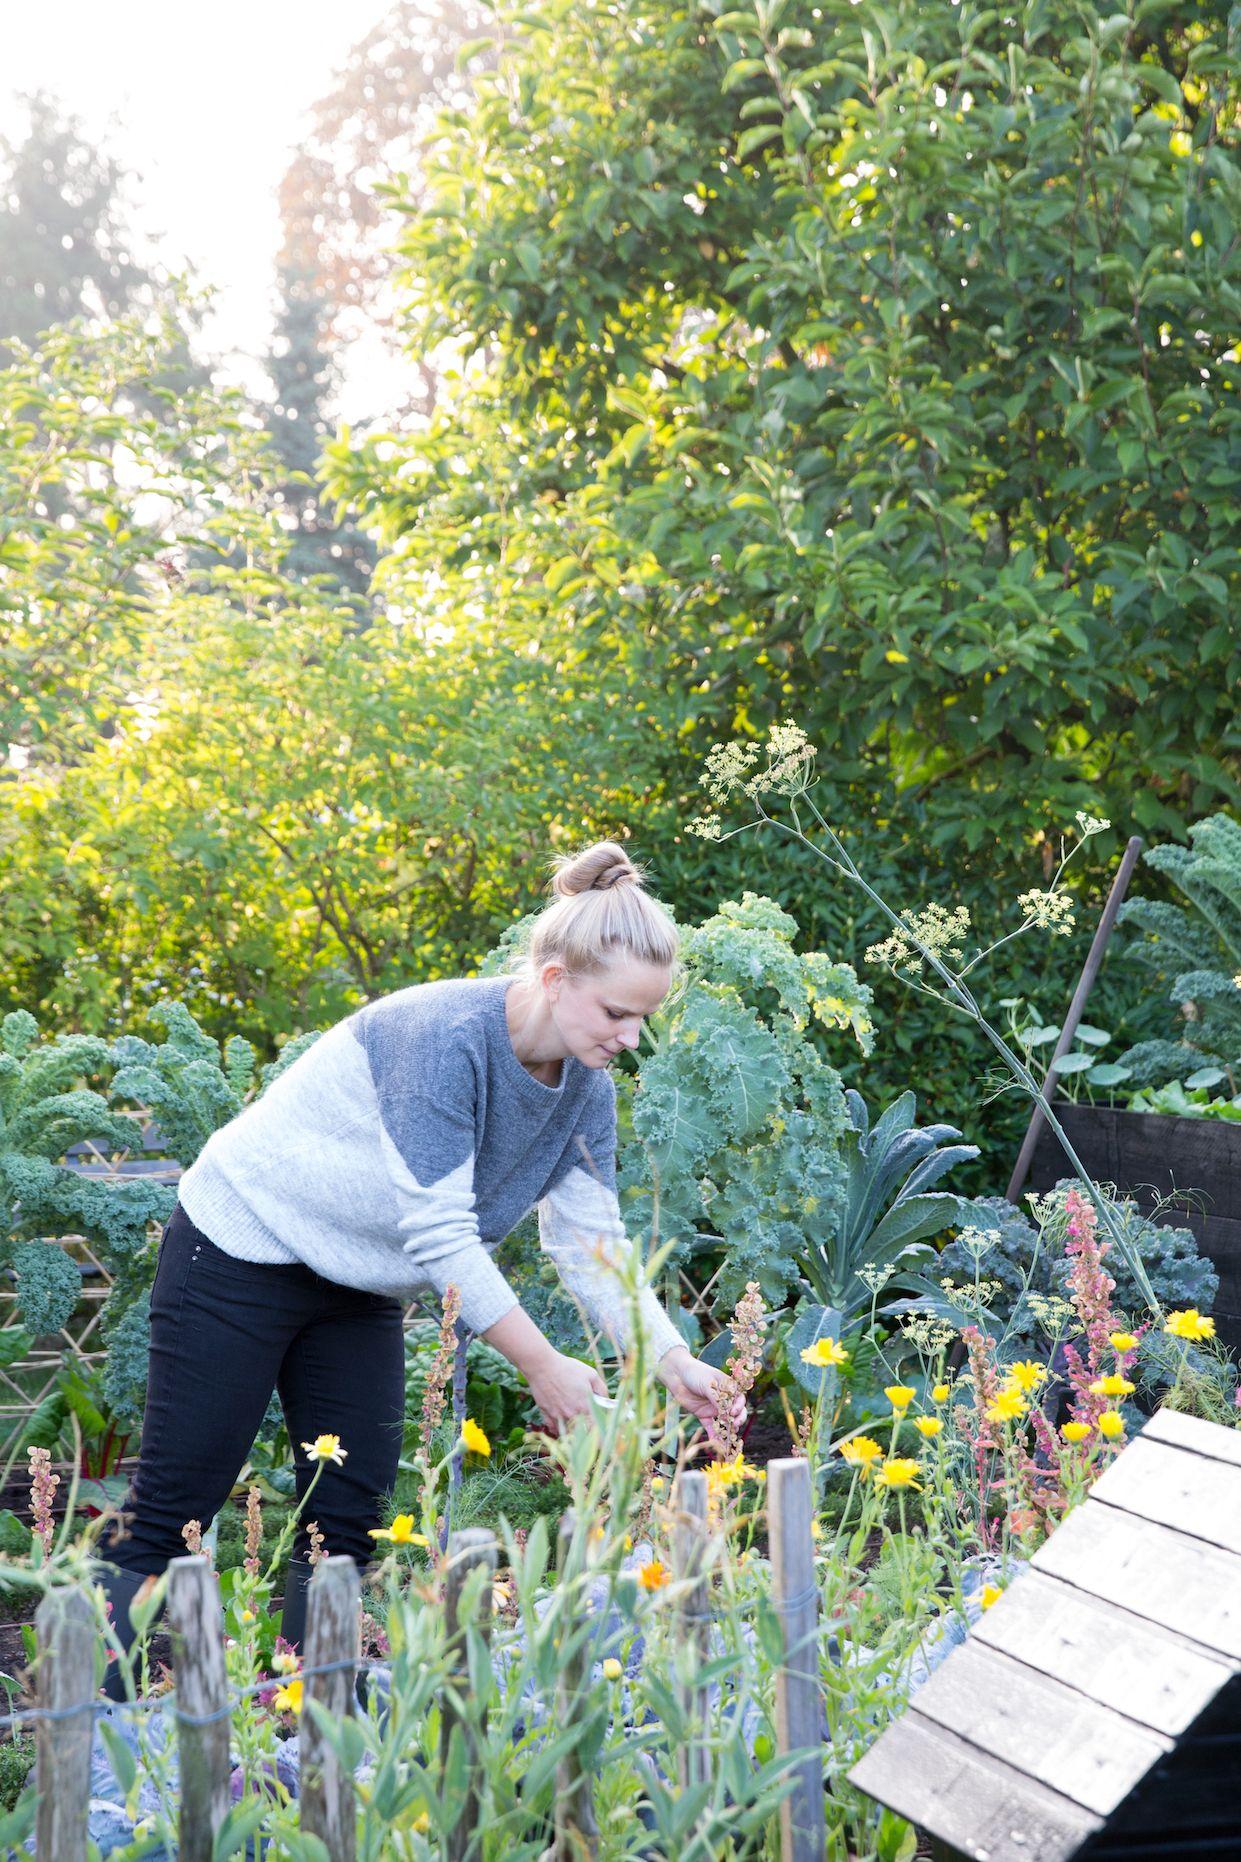 Theresas Kuche Theresa Trifft Marie Himmel Haus Und Garten Schrebergarten Garten